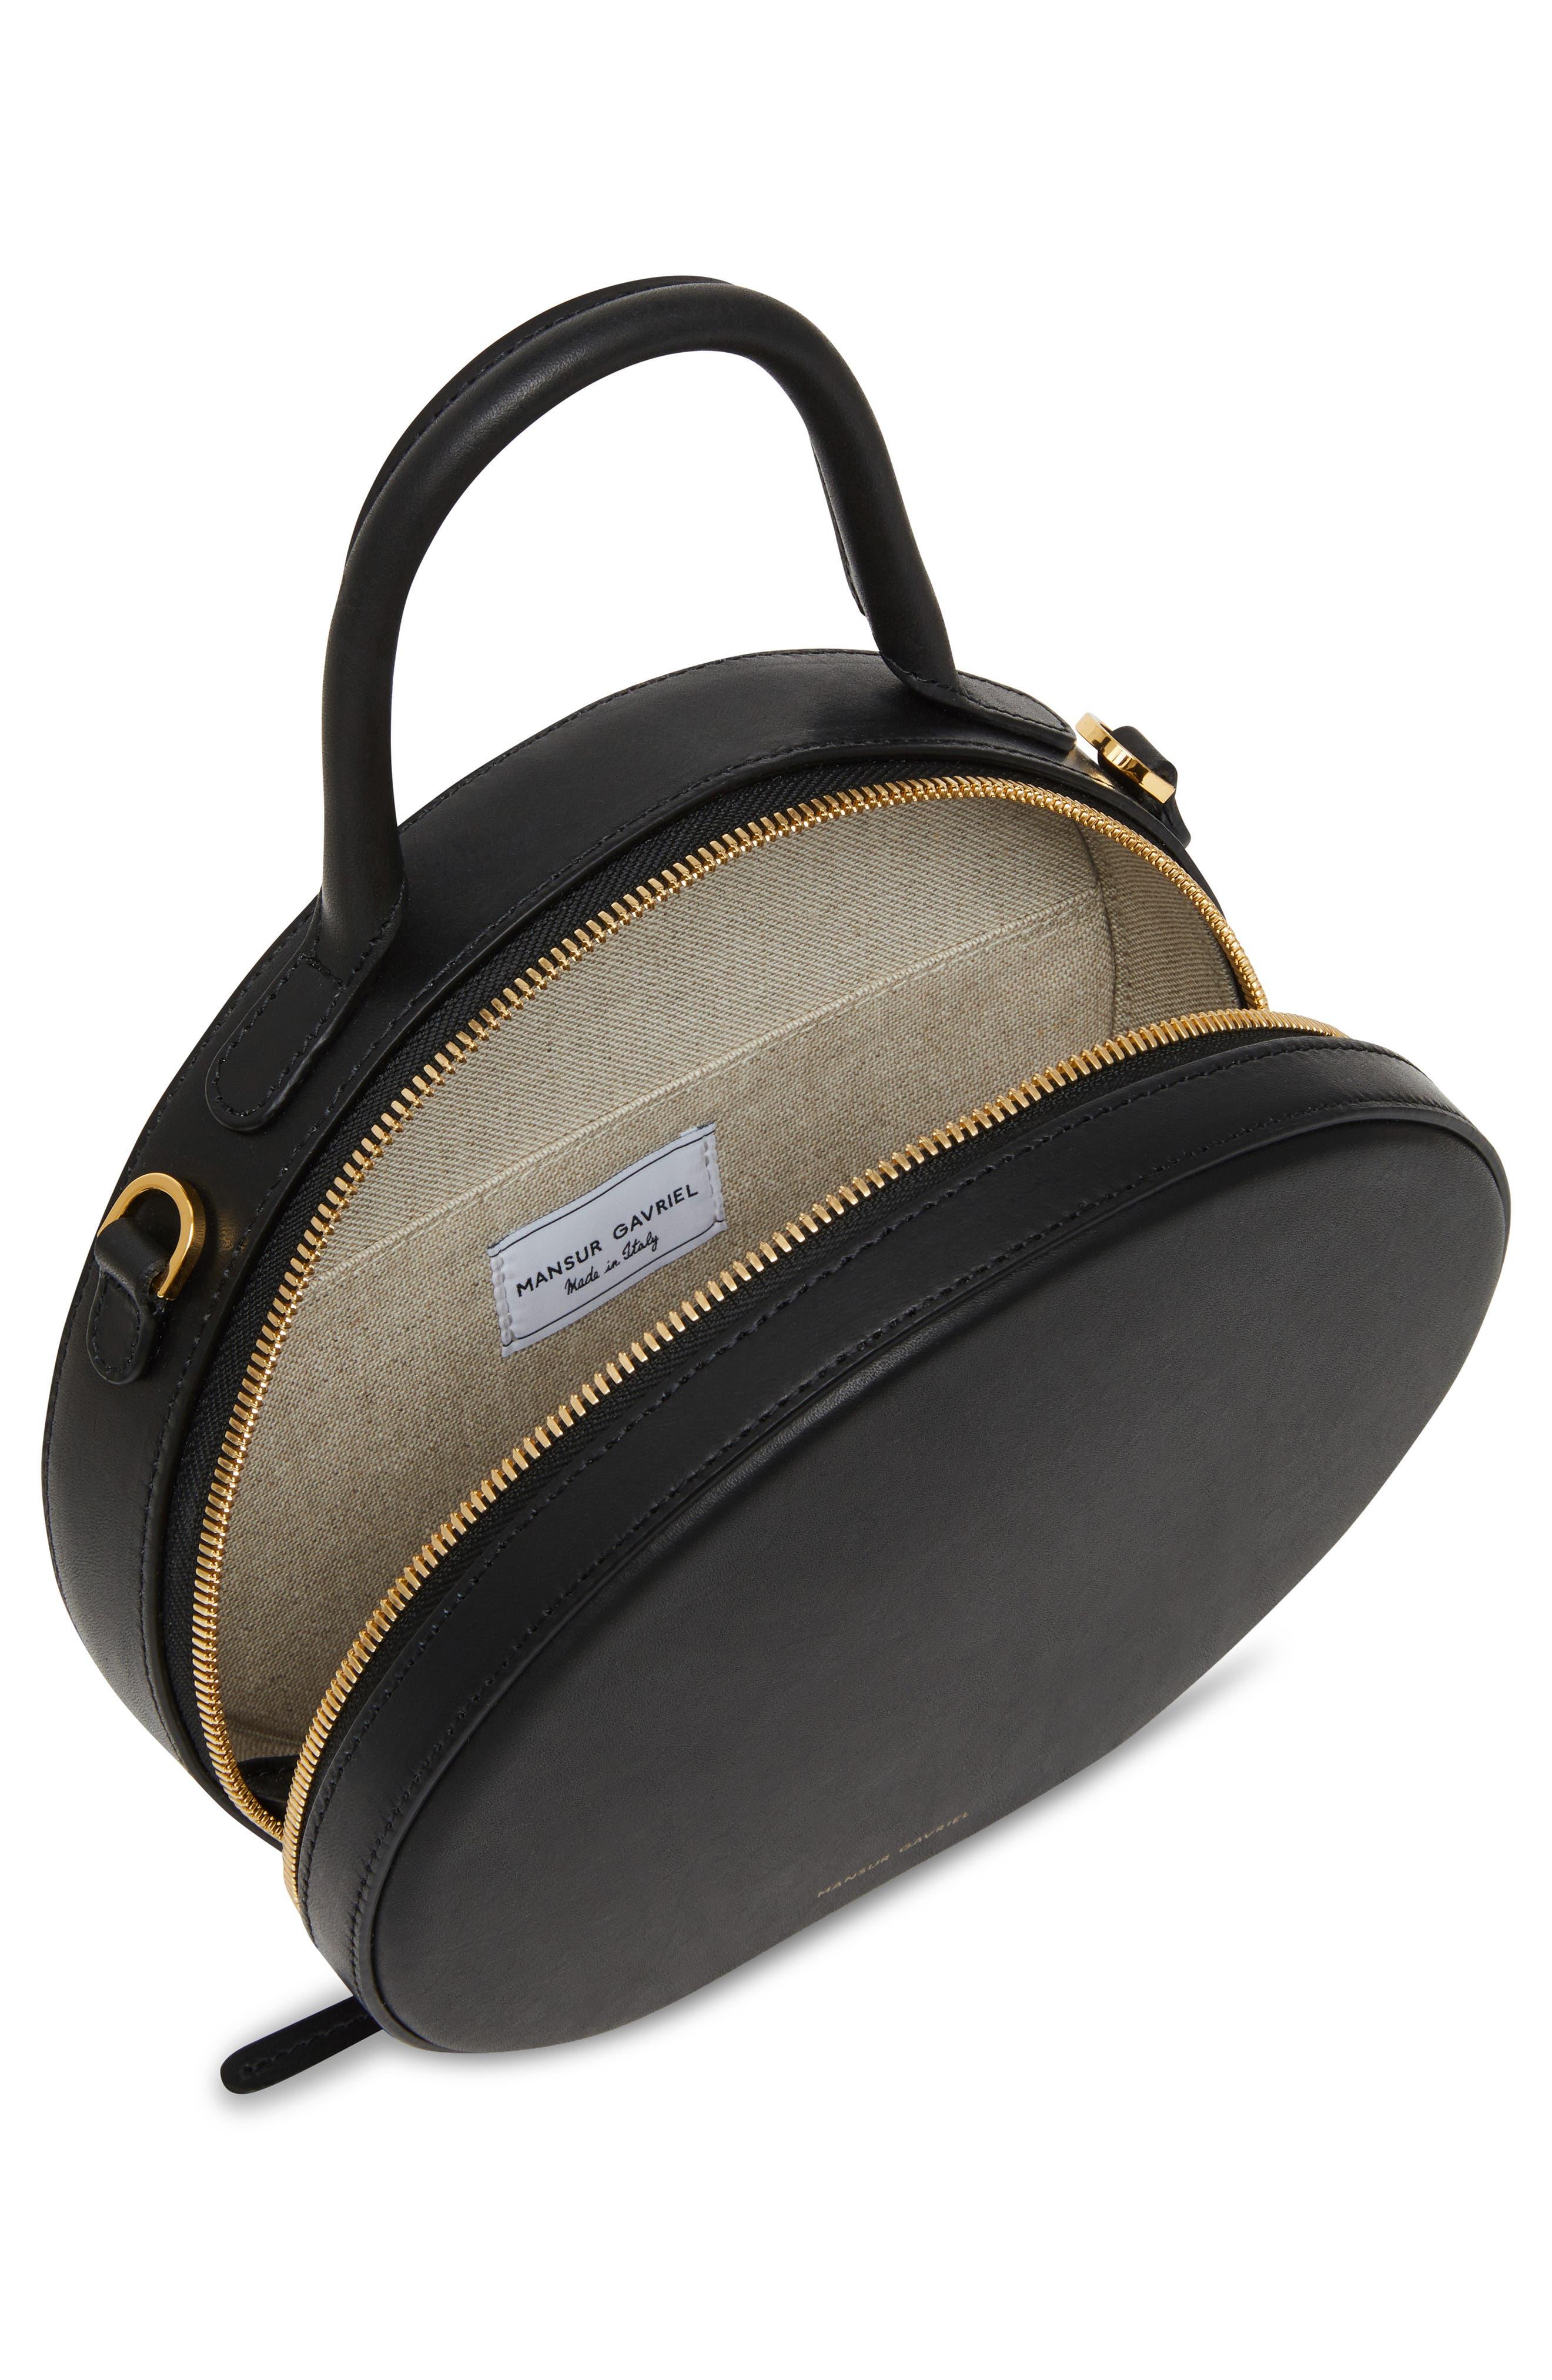 MANSUR GAVRIEL, Leather Circle Crossbody Bag, Alternate thumbnail 5, color, BLACK